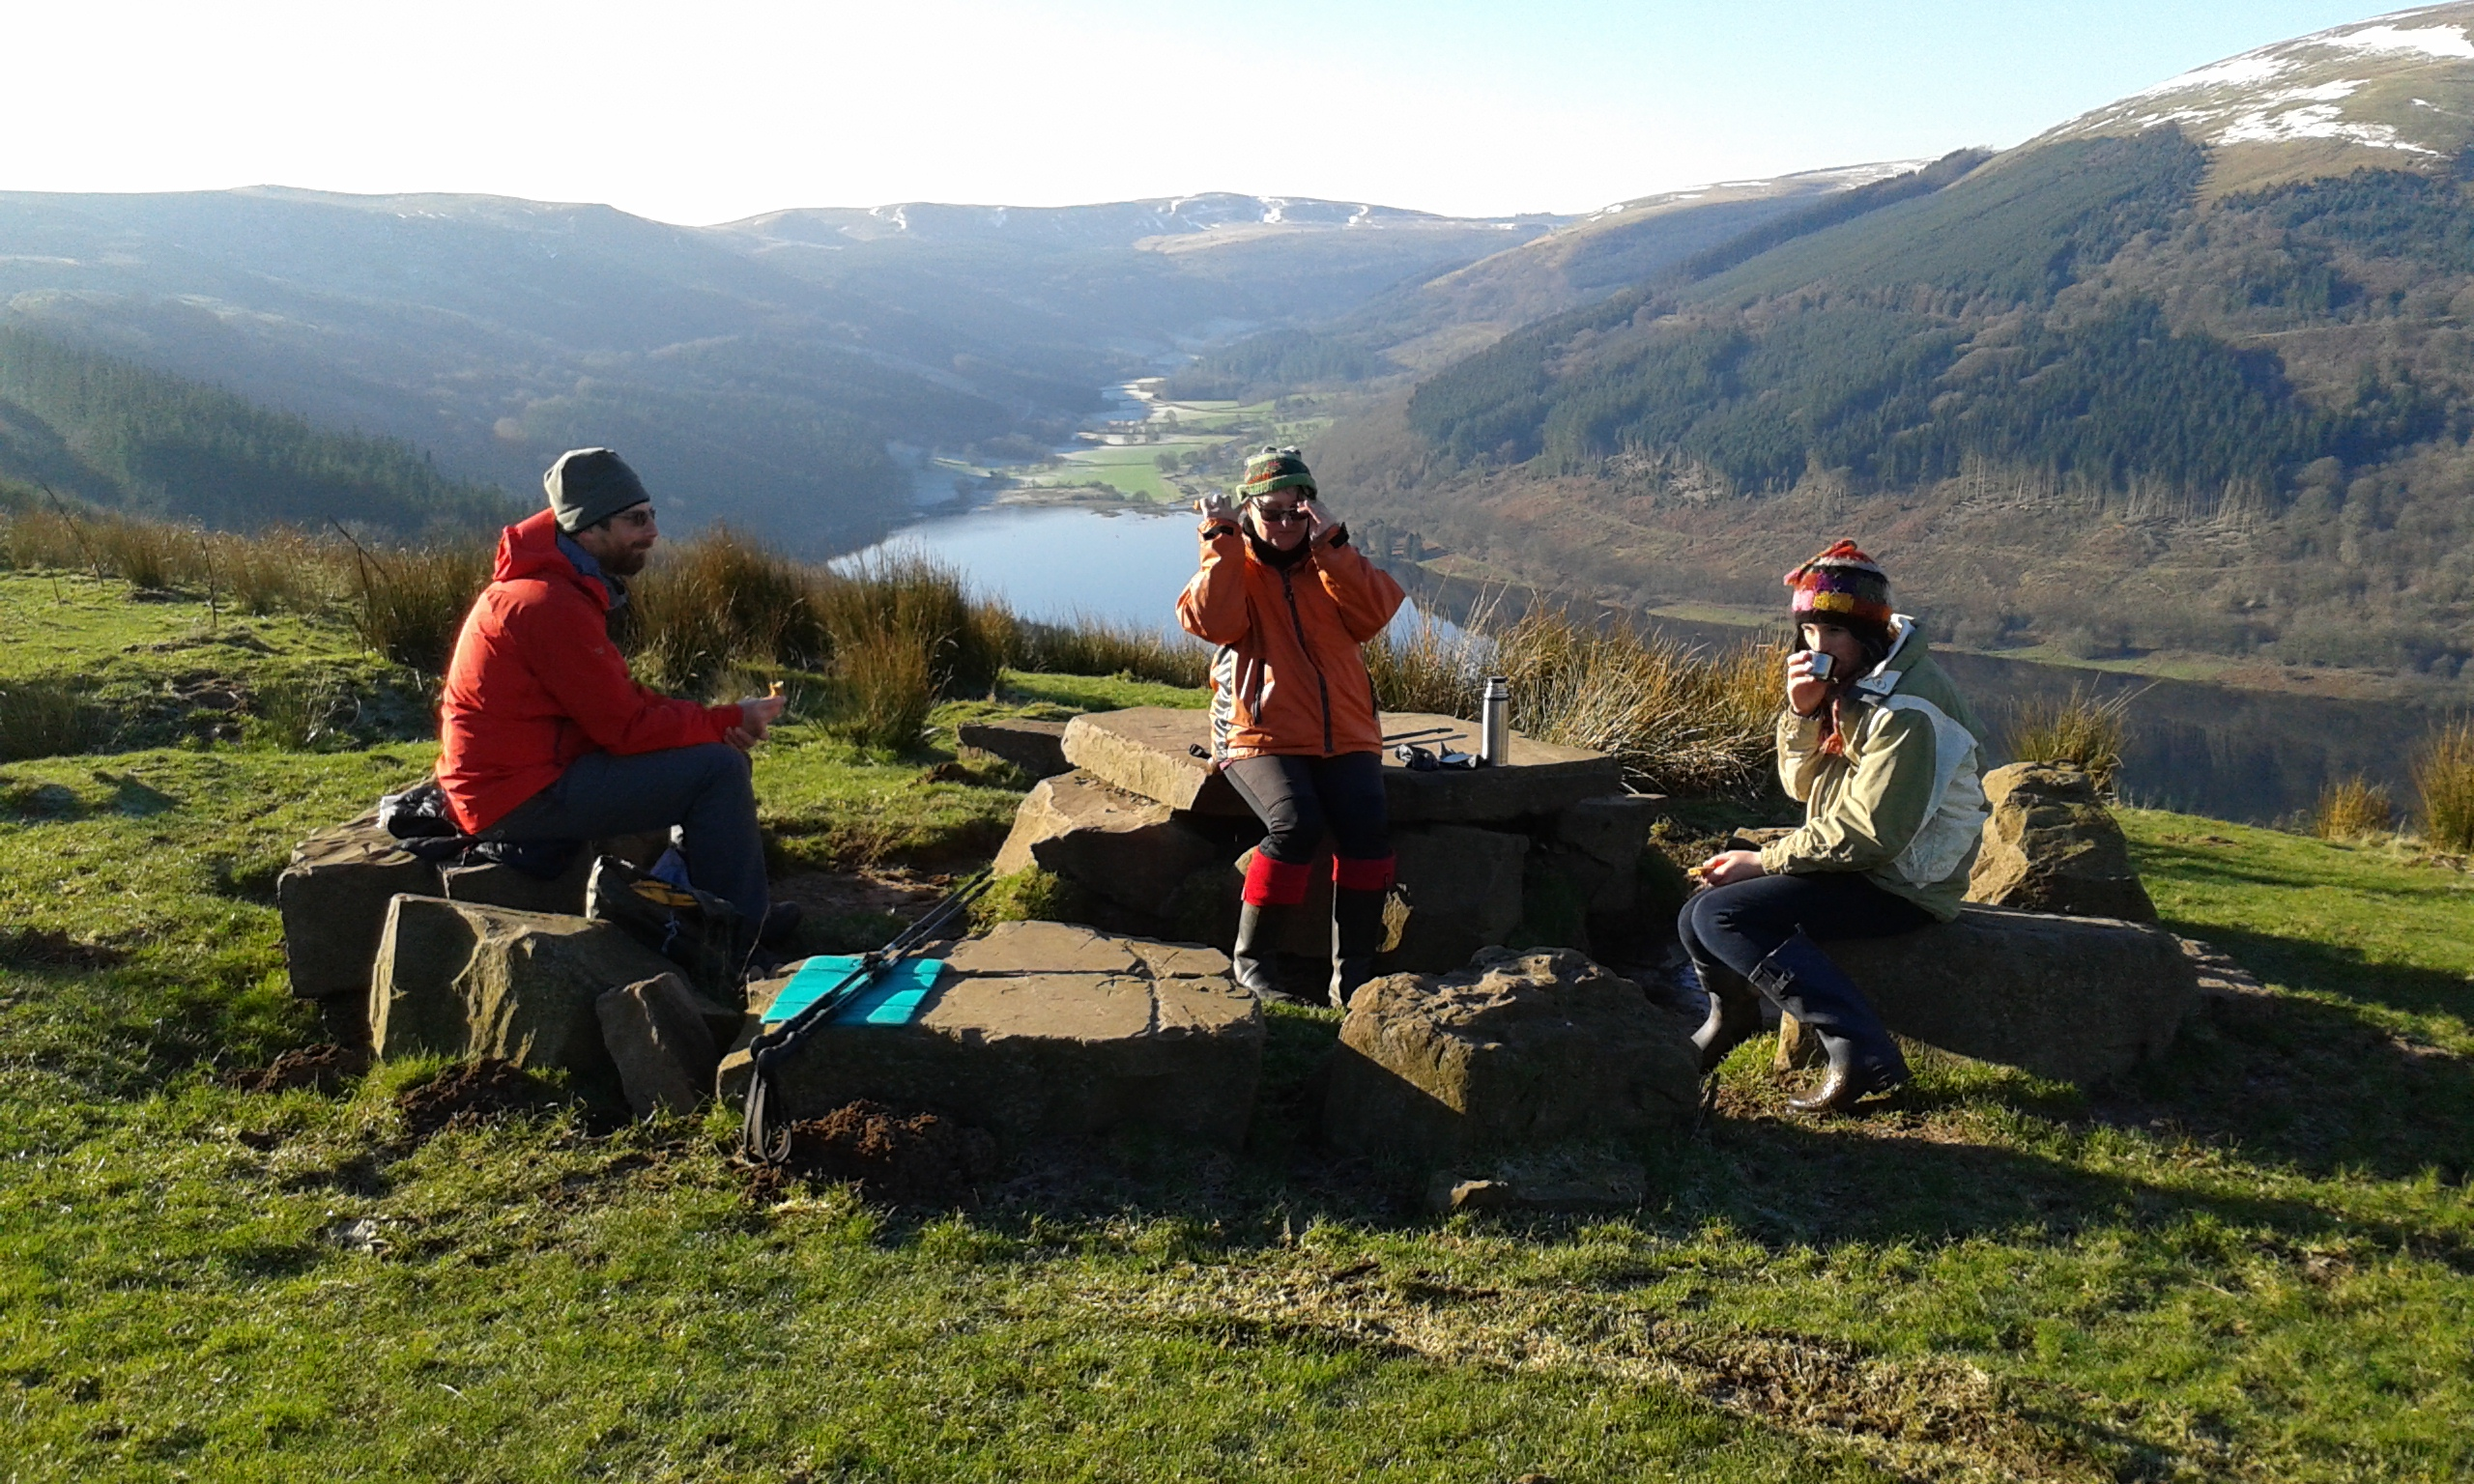 Winter picnic above Talybont reservoir.